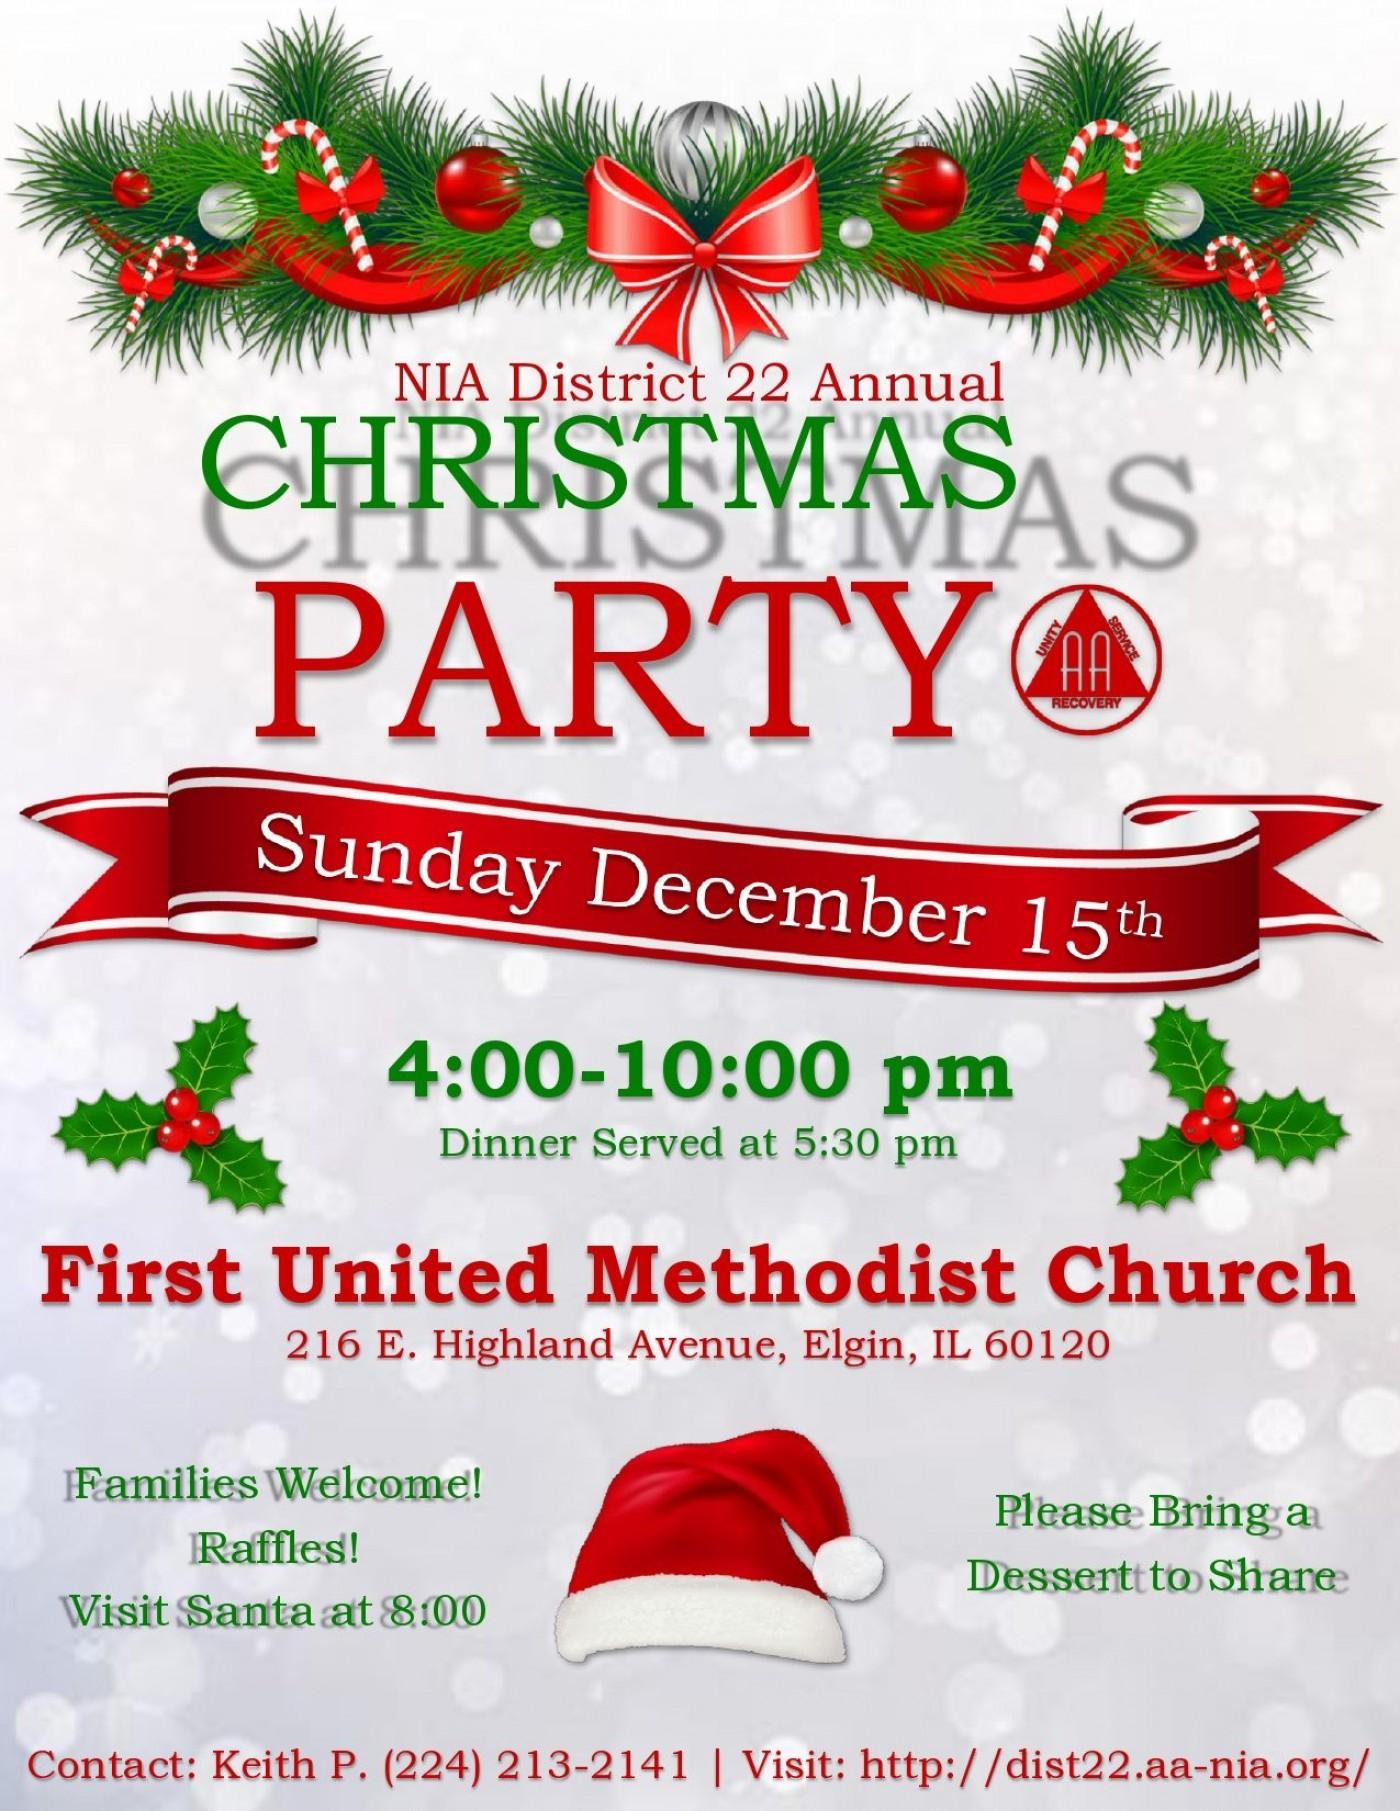 006 Phenomenal Free Church Christma Program Template Concept 1400